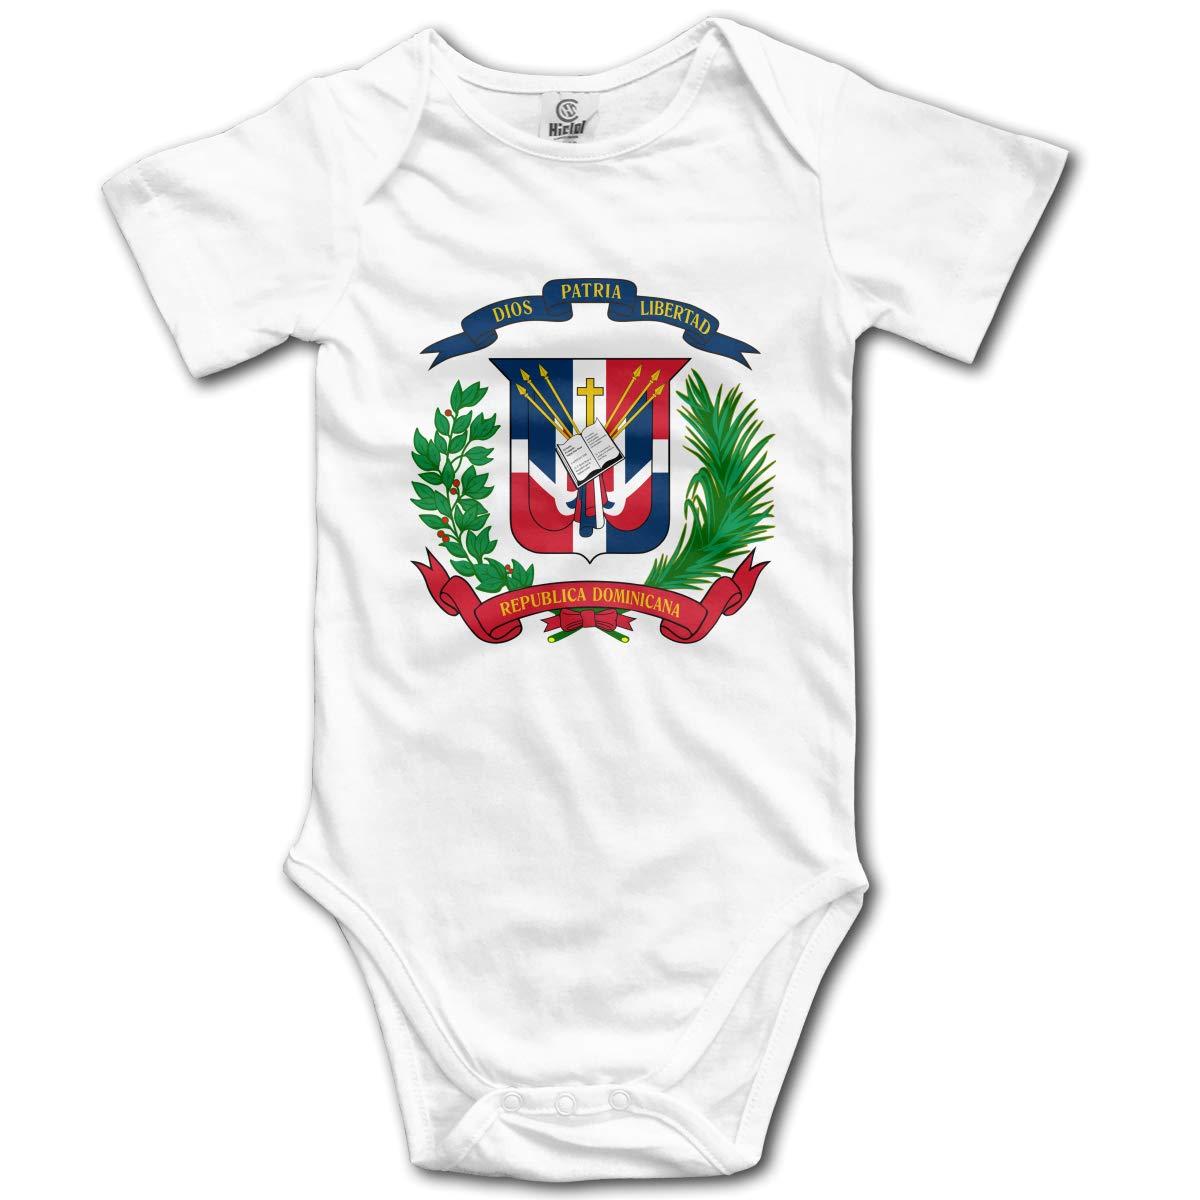 CDHL99 Dominican Republic Flag Infant Baby Boys Girls Short Sleeve Layette Bodysuit 0-24M